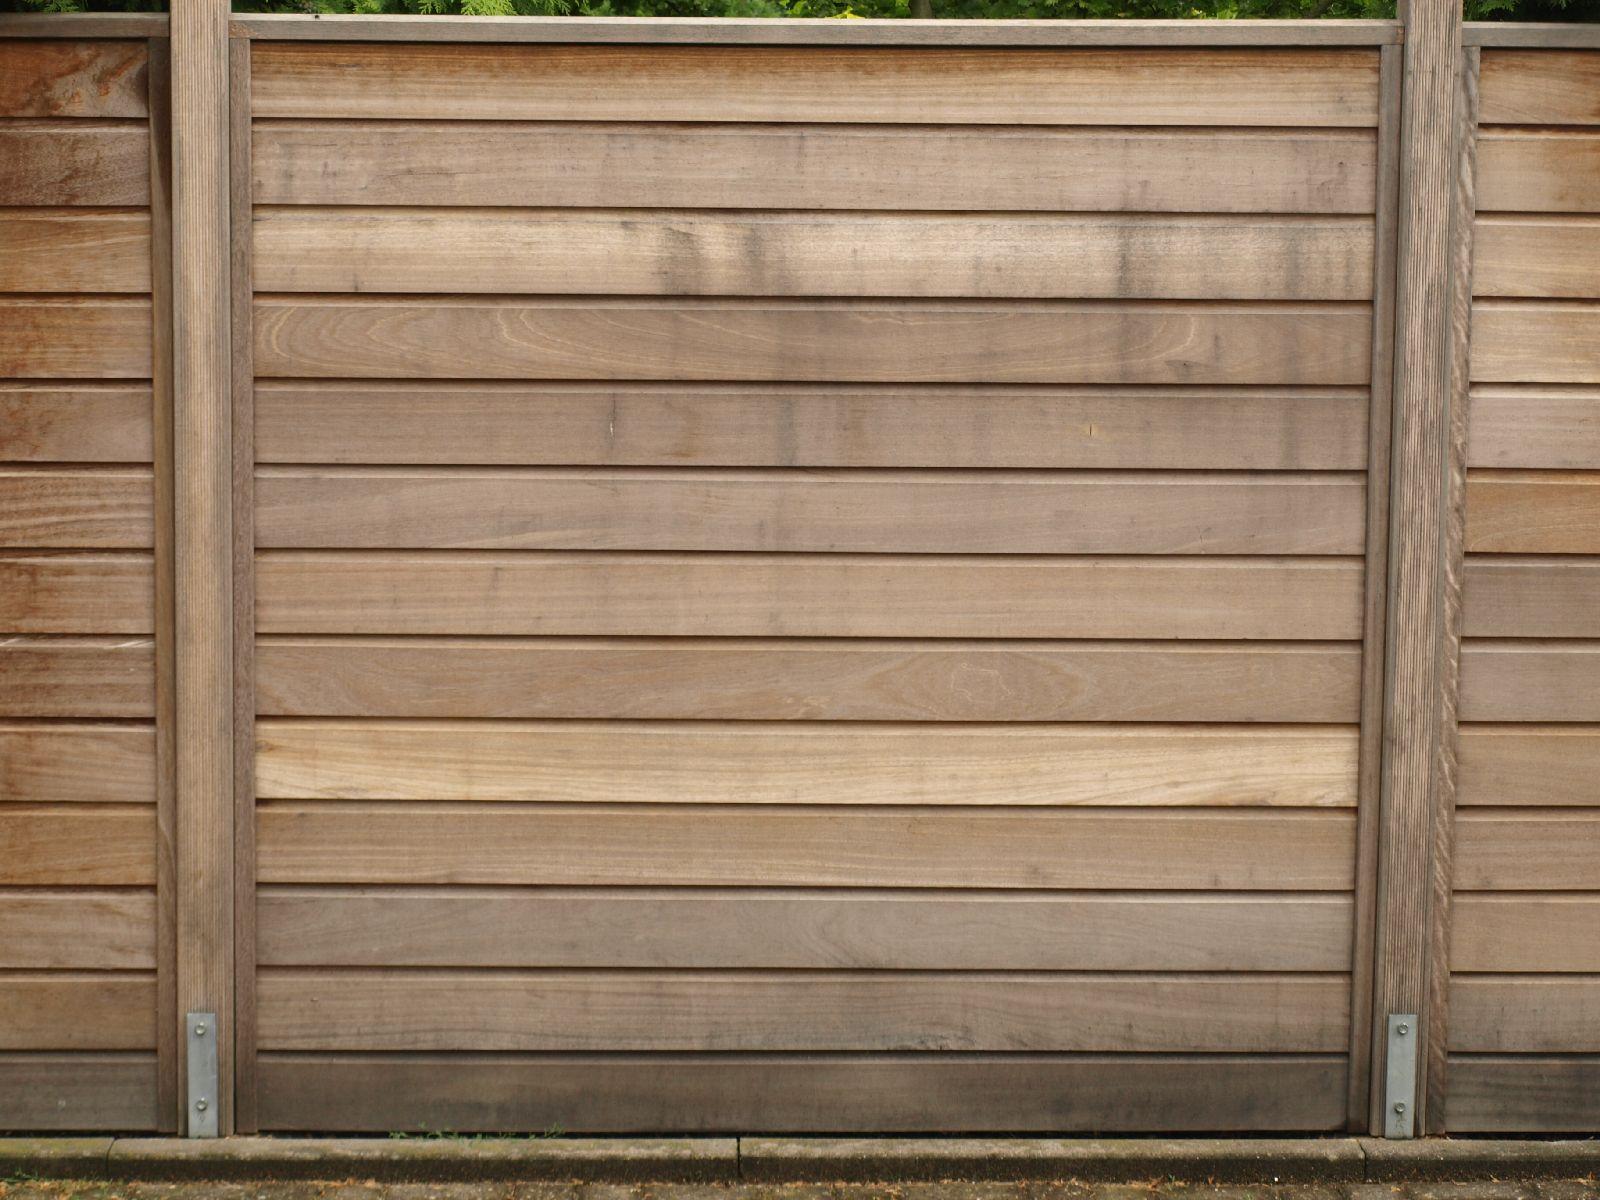 Wood_Texture_A_P8029025